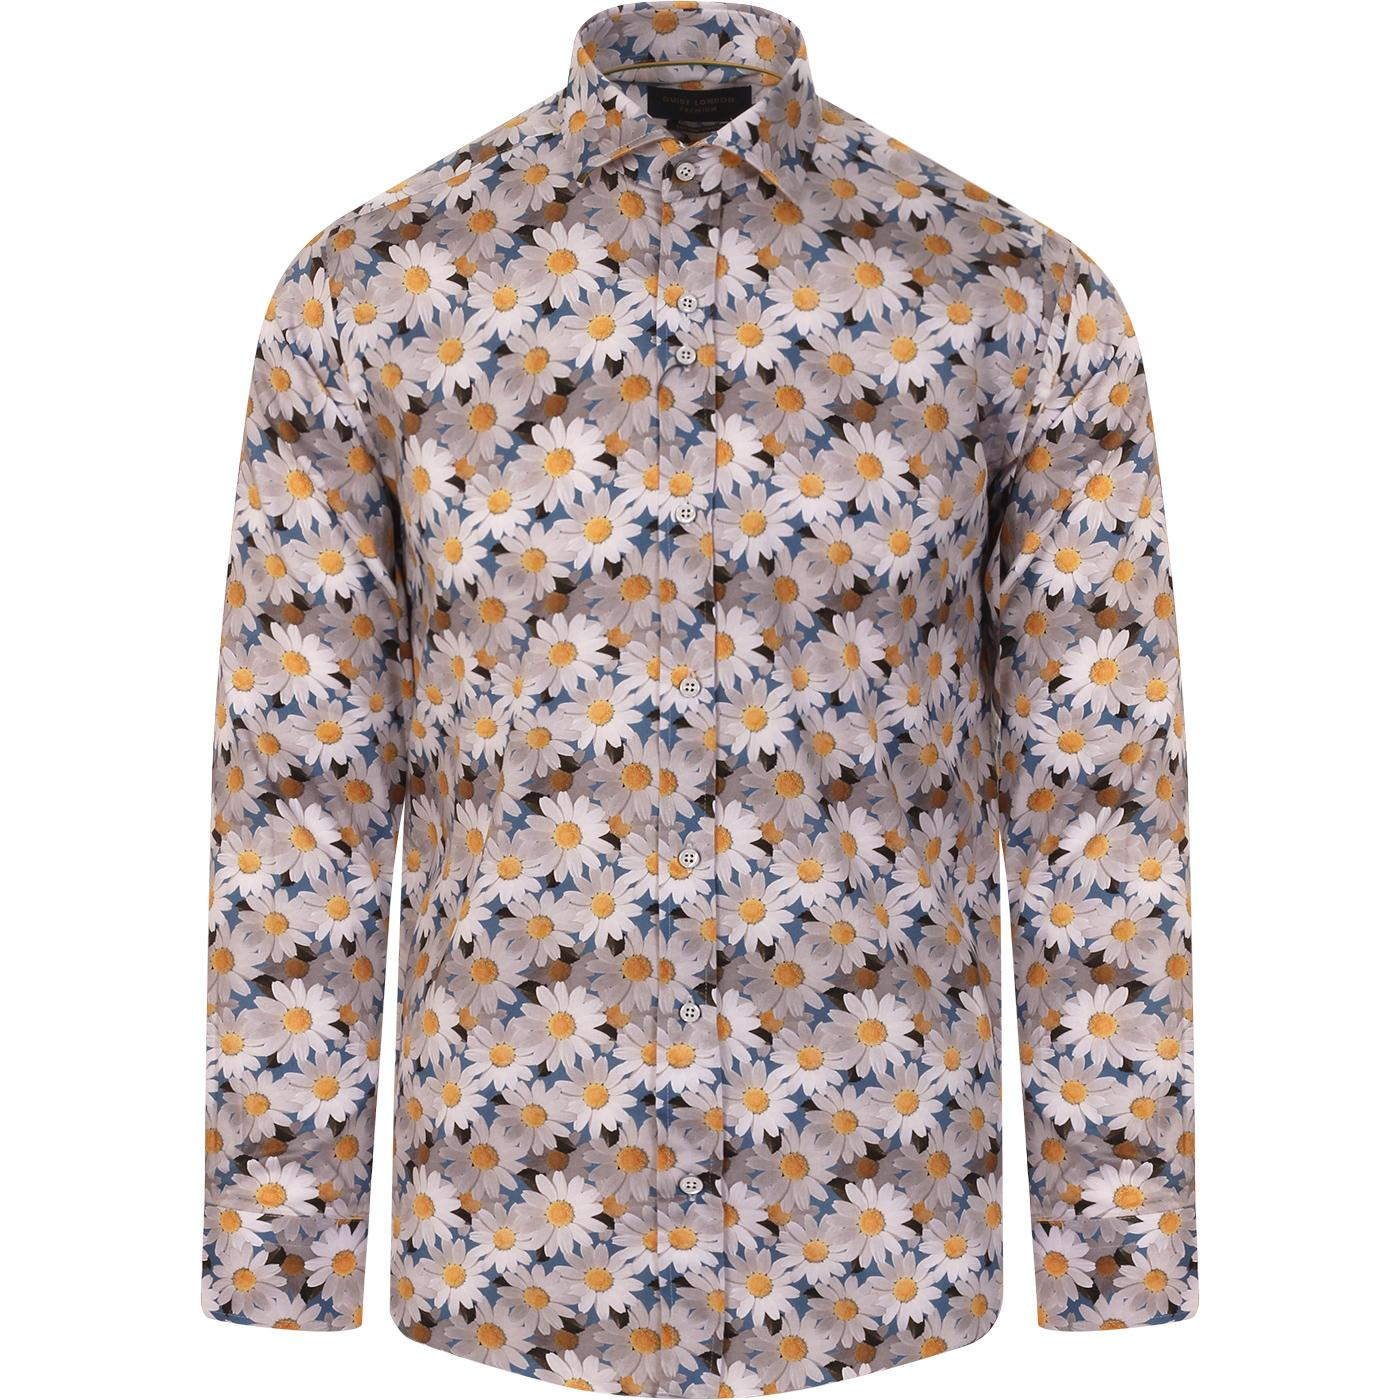 GUIDE LONDON 60s Mod Floral Daisy Print Shirt